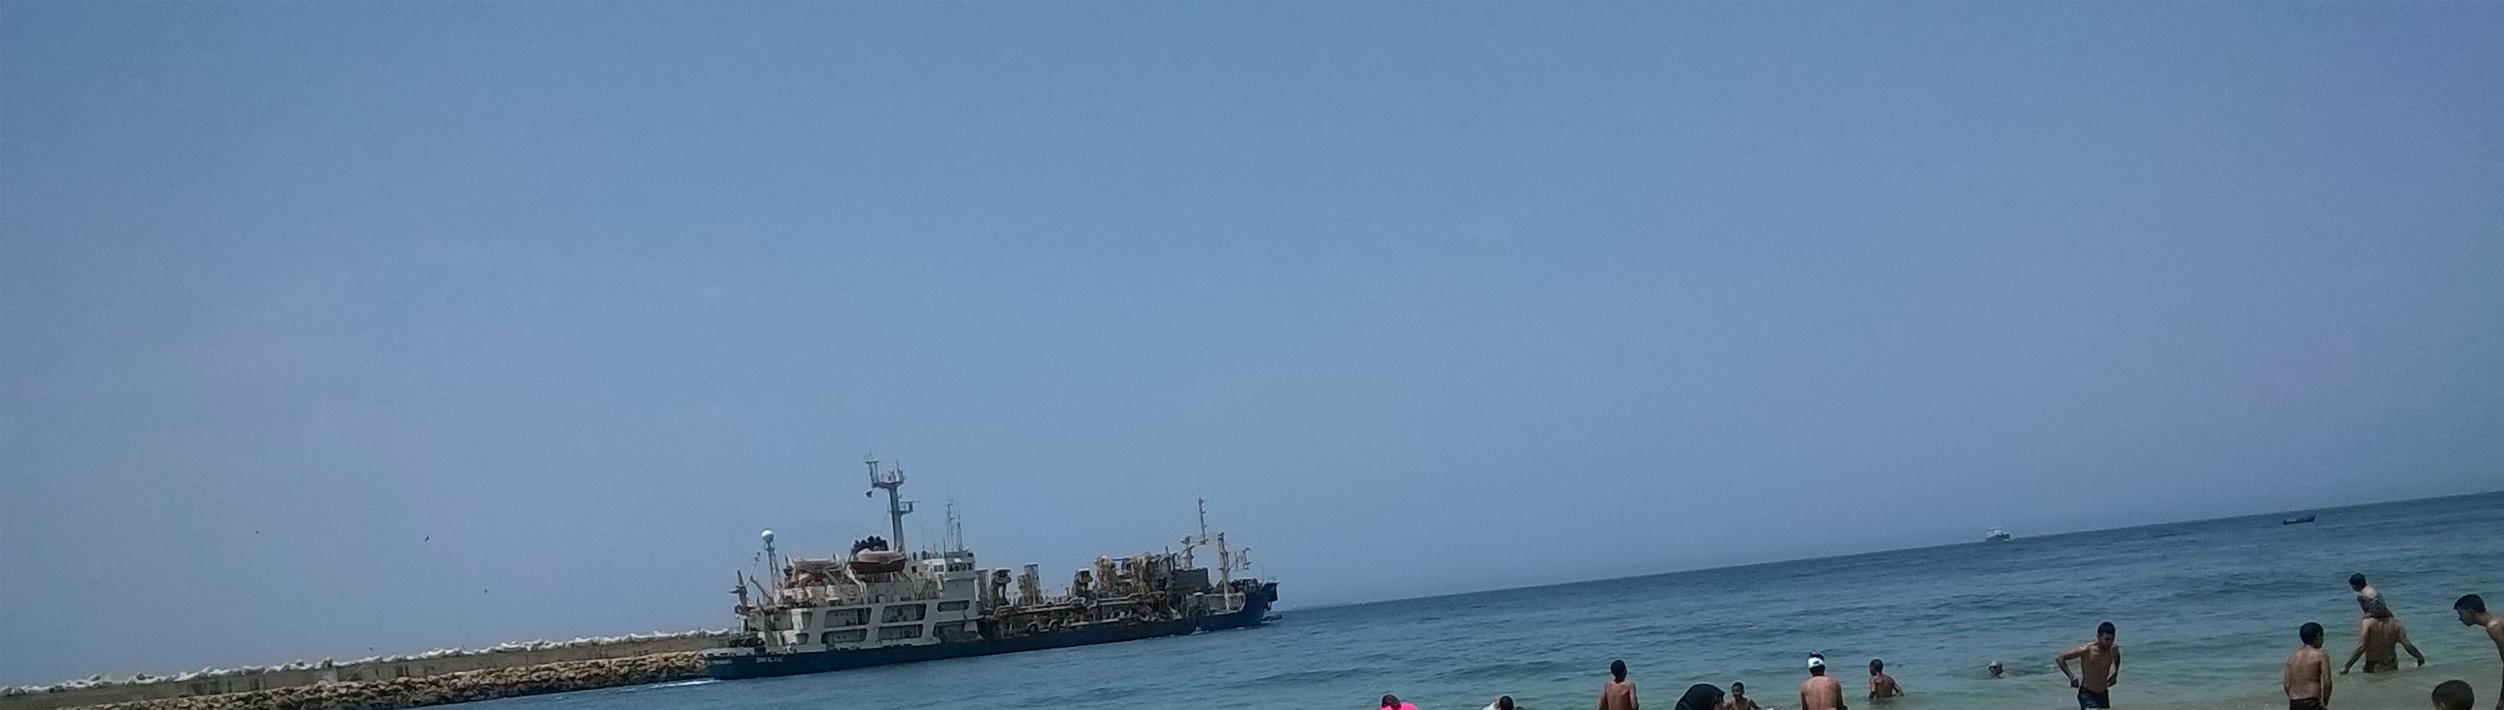 Ports Nationaux (Photos & News ) - Page 3 690973WP20150722130206Pro